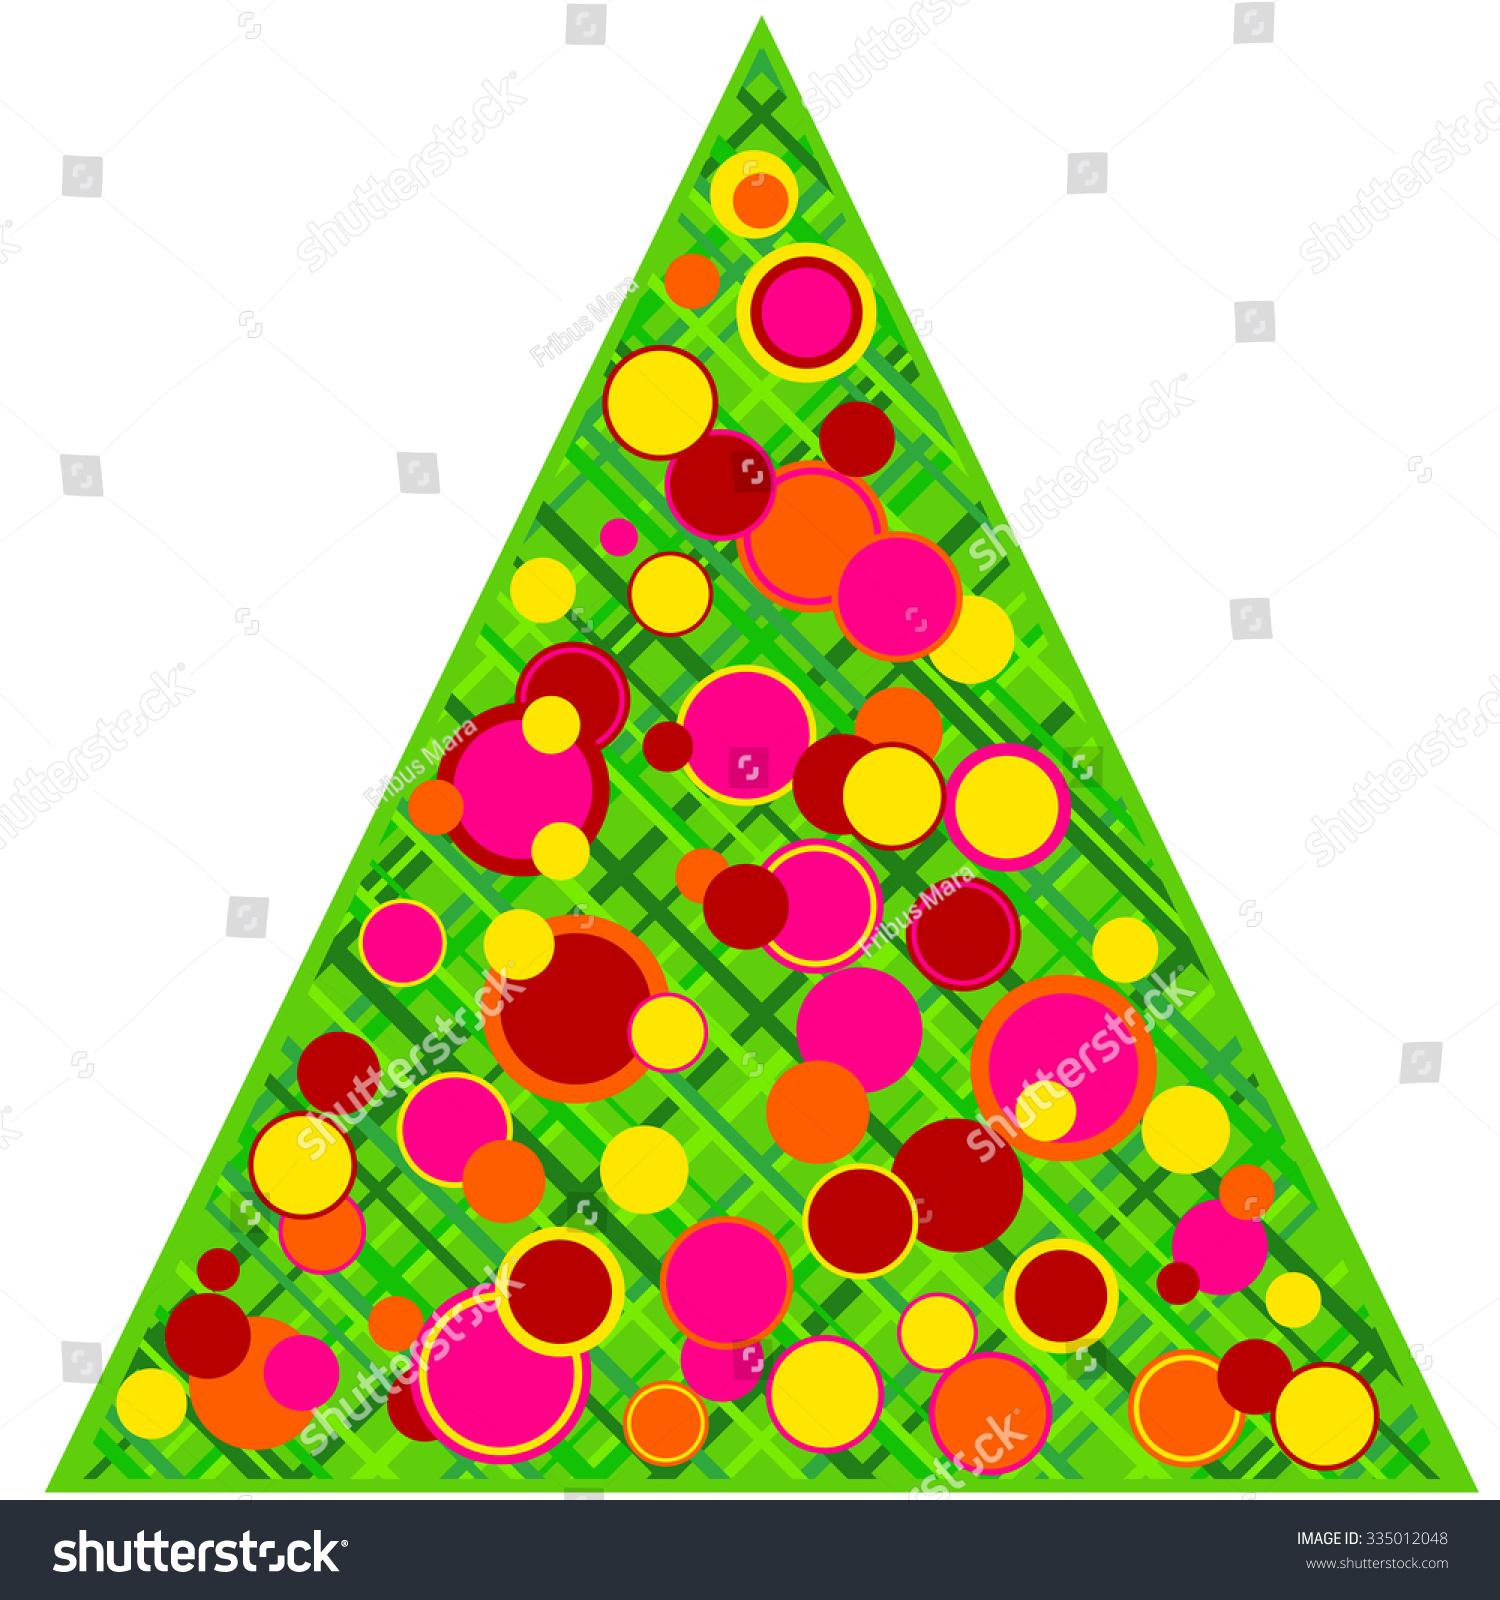 Stylized christmas tree disco ornaments stock illustration